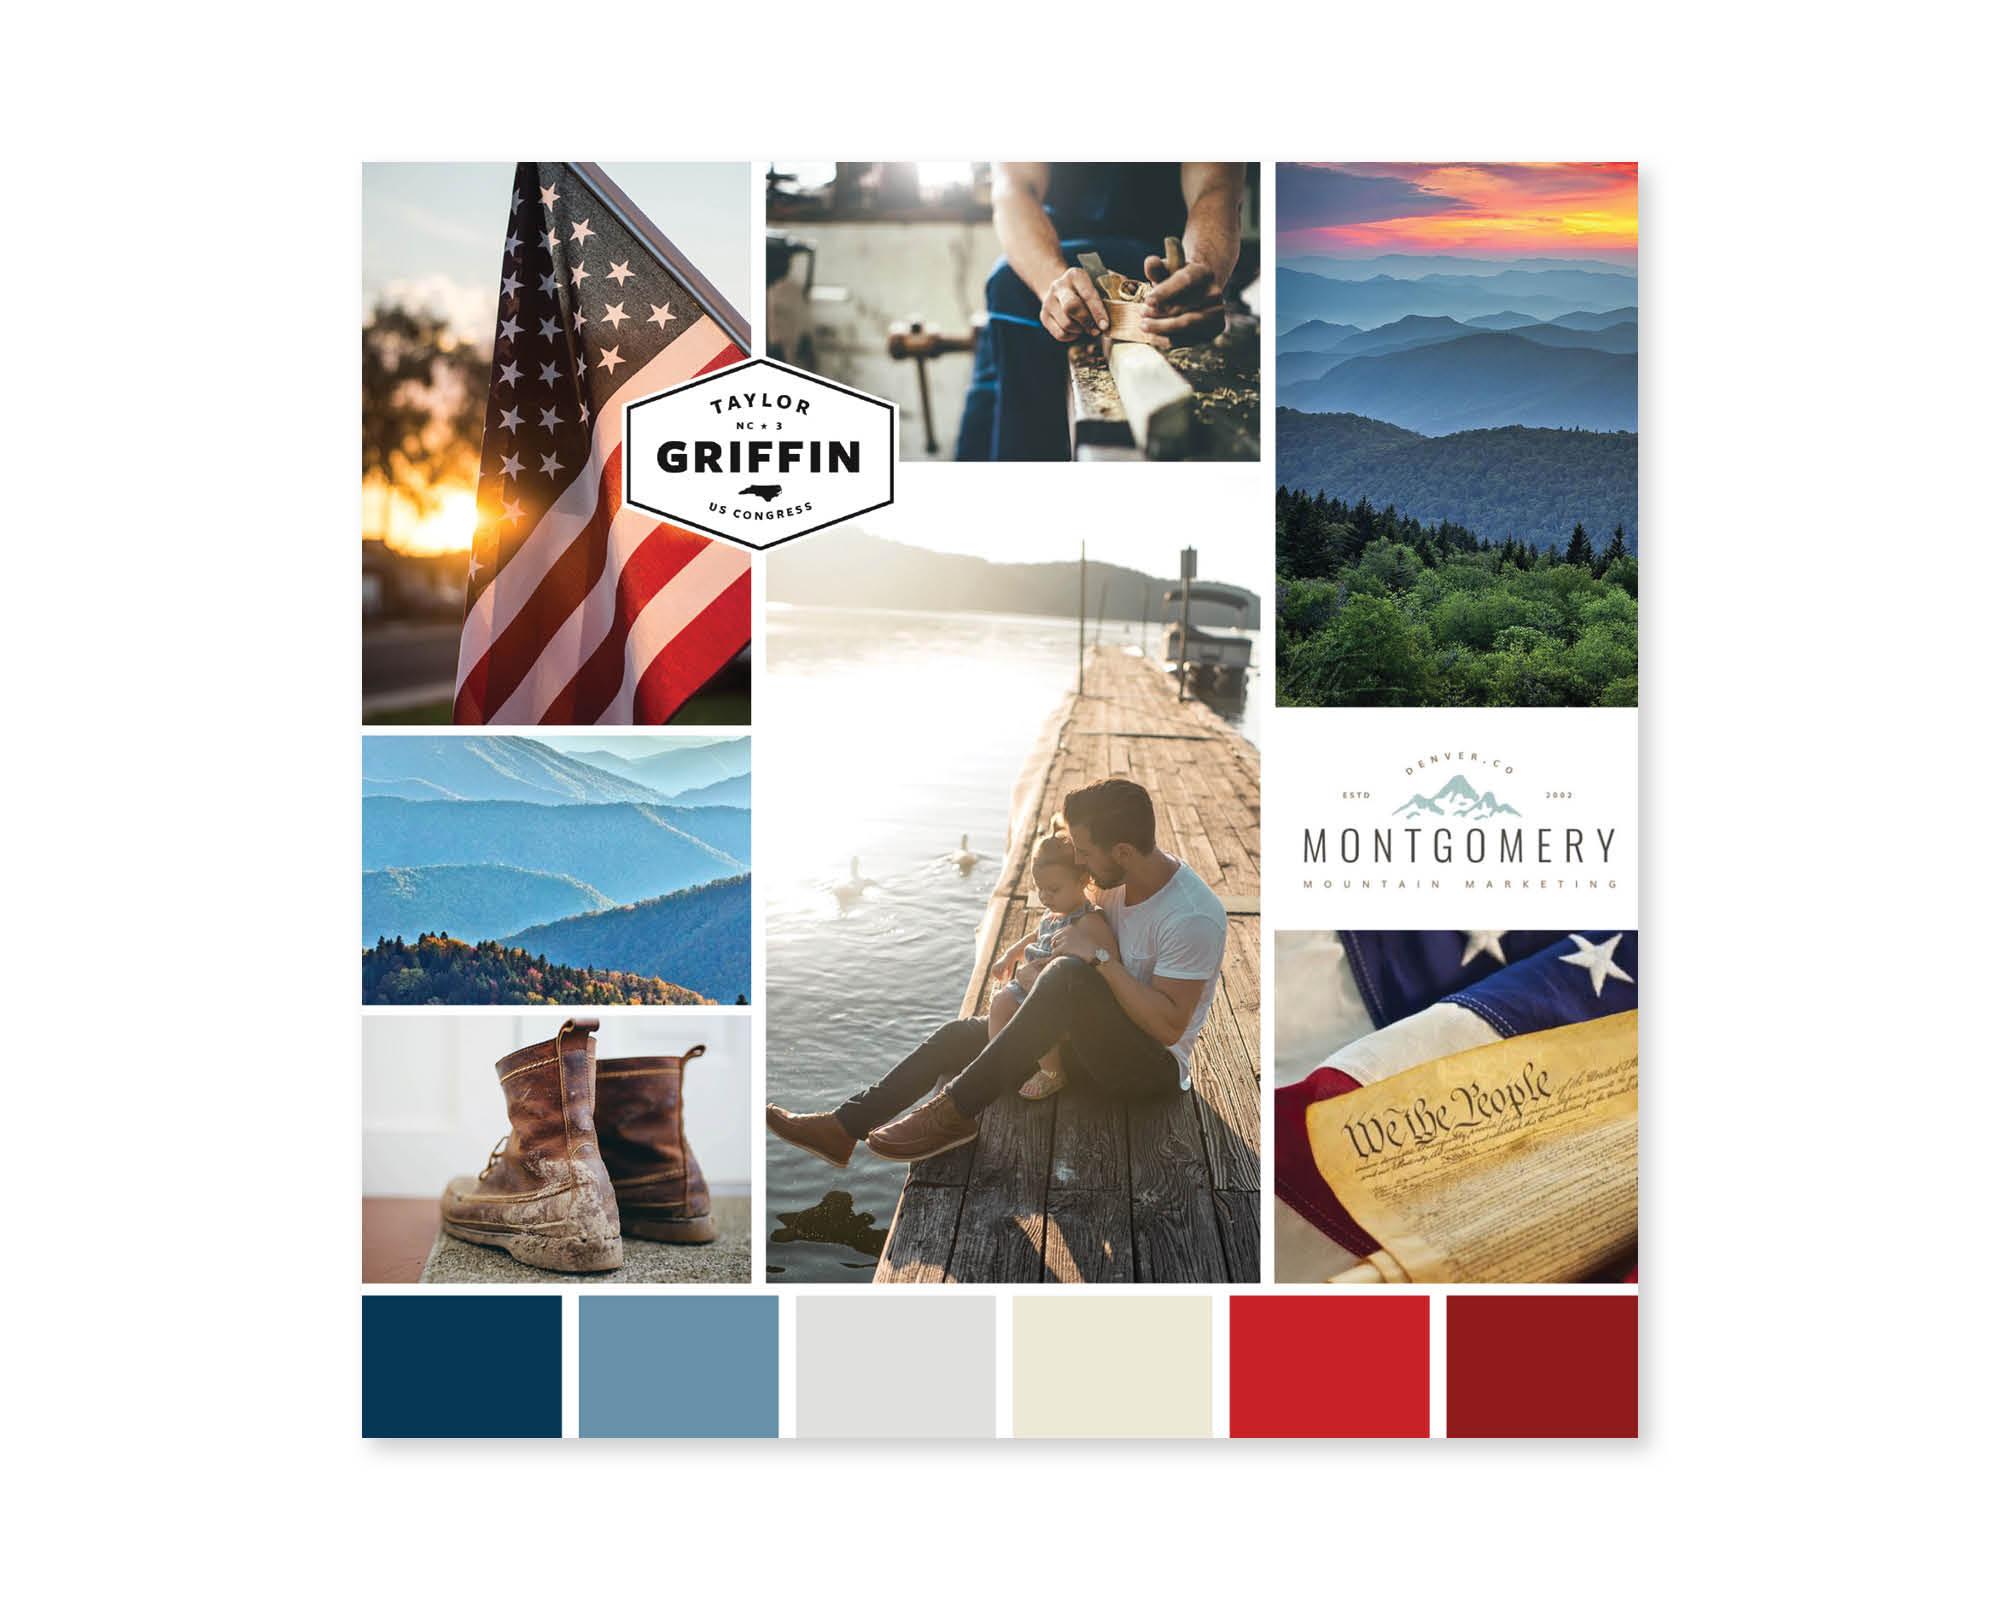 Blankenship for Congress | Inspiration Board by Casi Long Design | casilong.com